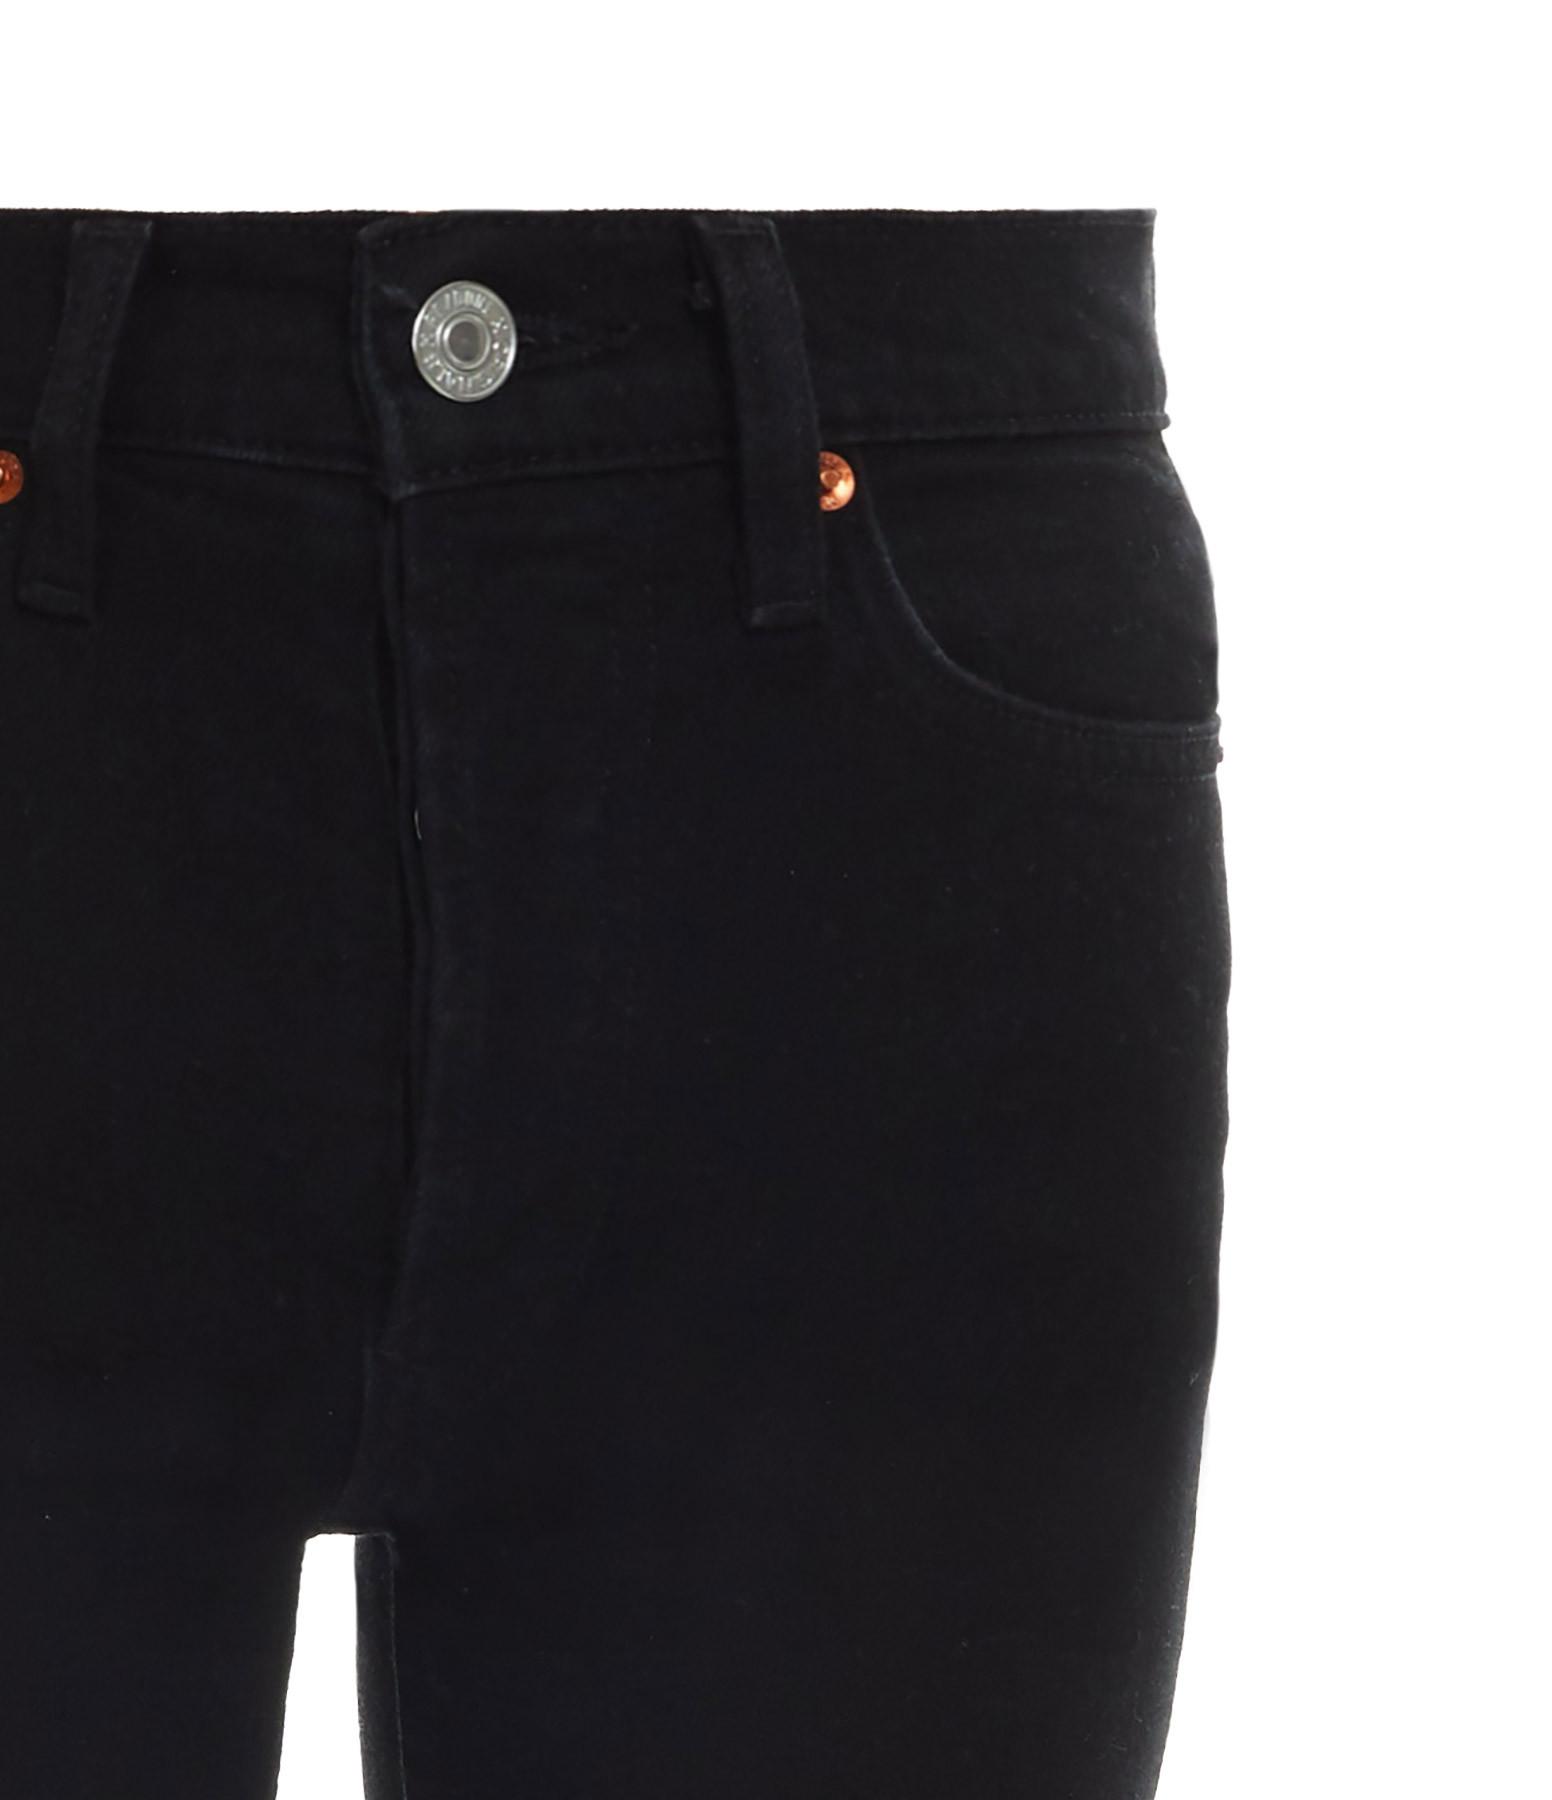 RE/DONE - Jean Crop Taille Haute Noir